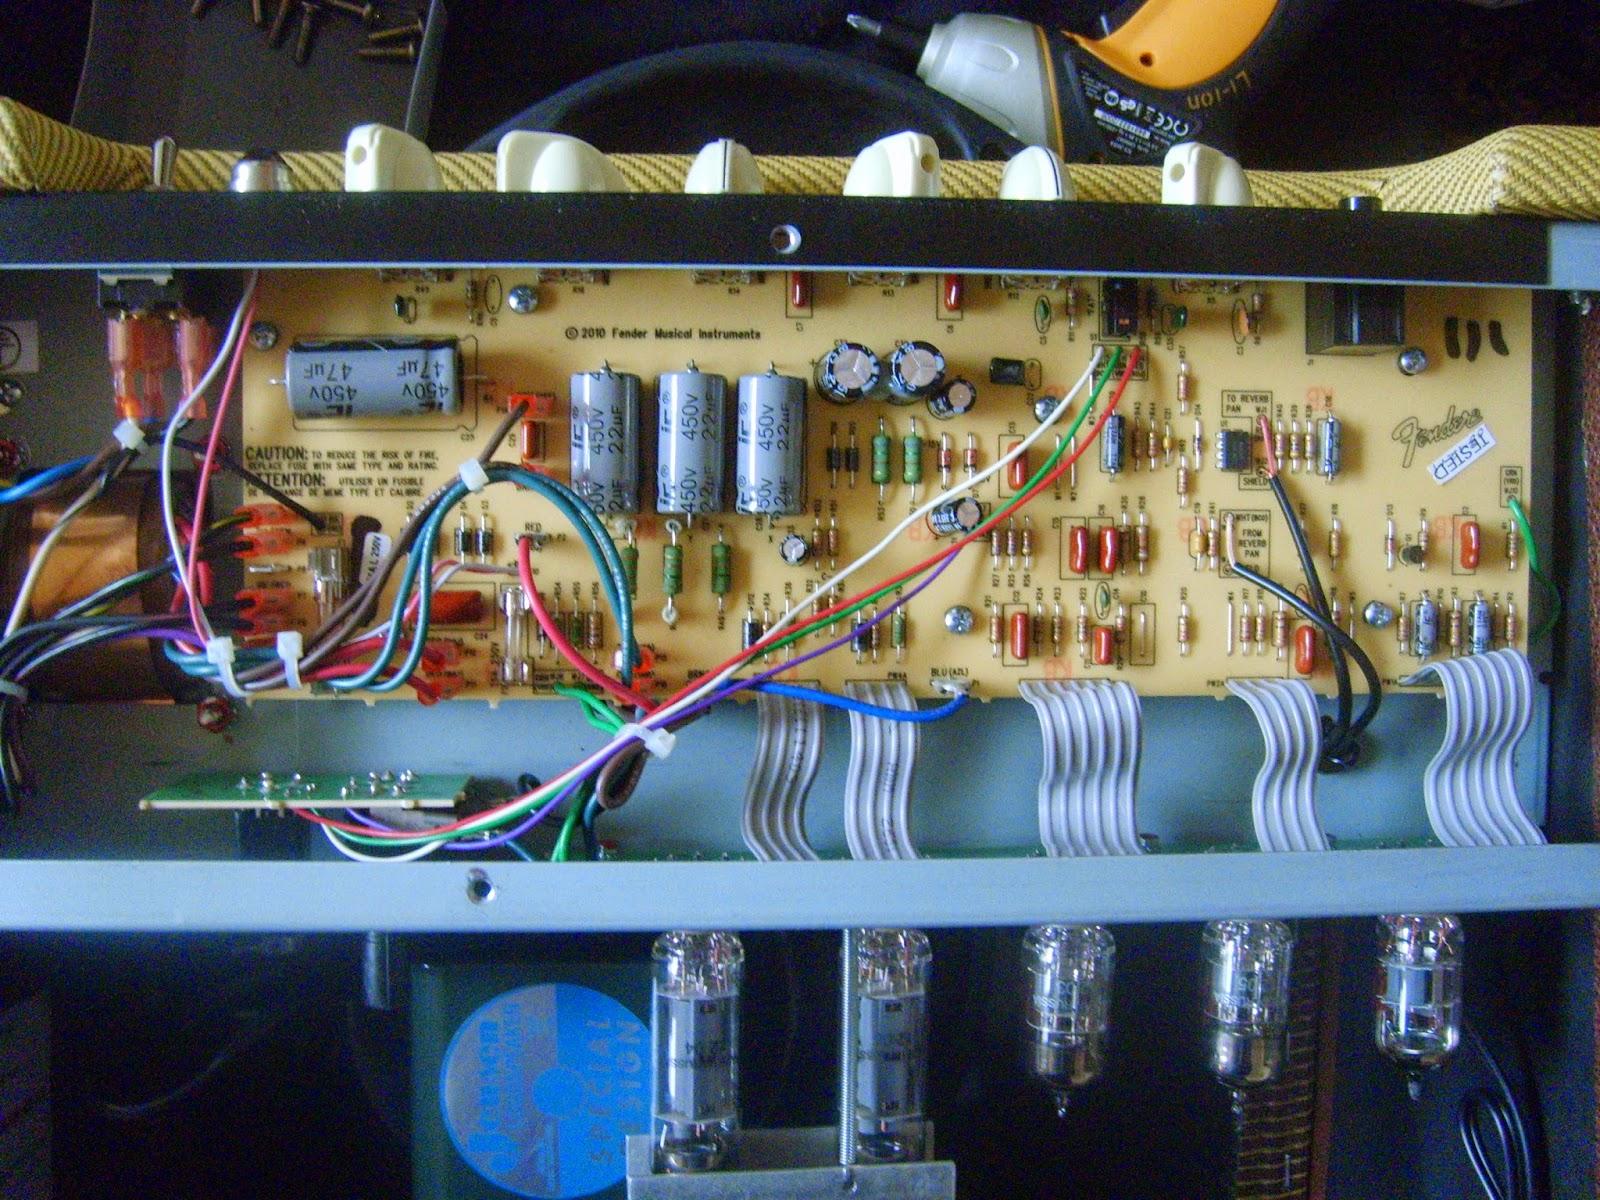 Fender Blues Junior Wiring Diagram | Wiring Liry on prs se wiring diagram, rickenbacker wiring diagram, fender blues junior chassis, ampeg svt wiring diagram, archtop wiring diagram, epiphone wiring diagram, yamaha wiring diagram, amp wiring diagram, dean ml wiring diagram, duesenberg wiring diagram, fender blues junior power supply, vox wiring diagram, marshall wiring diagram, egnater wiring diagram, gibson wiring diagram, ibanez wiring diagram, fender blues junior serial number,